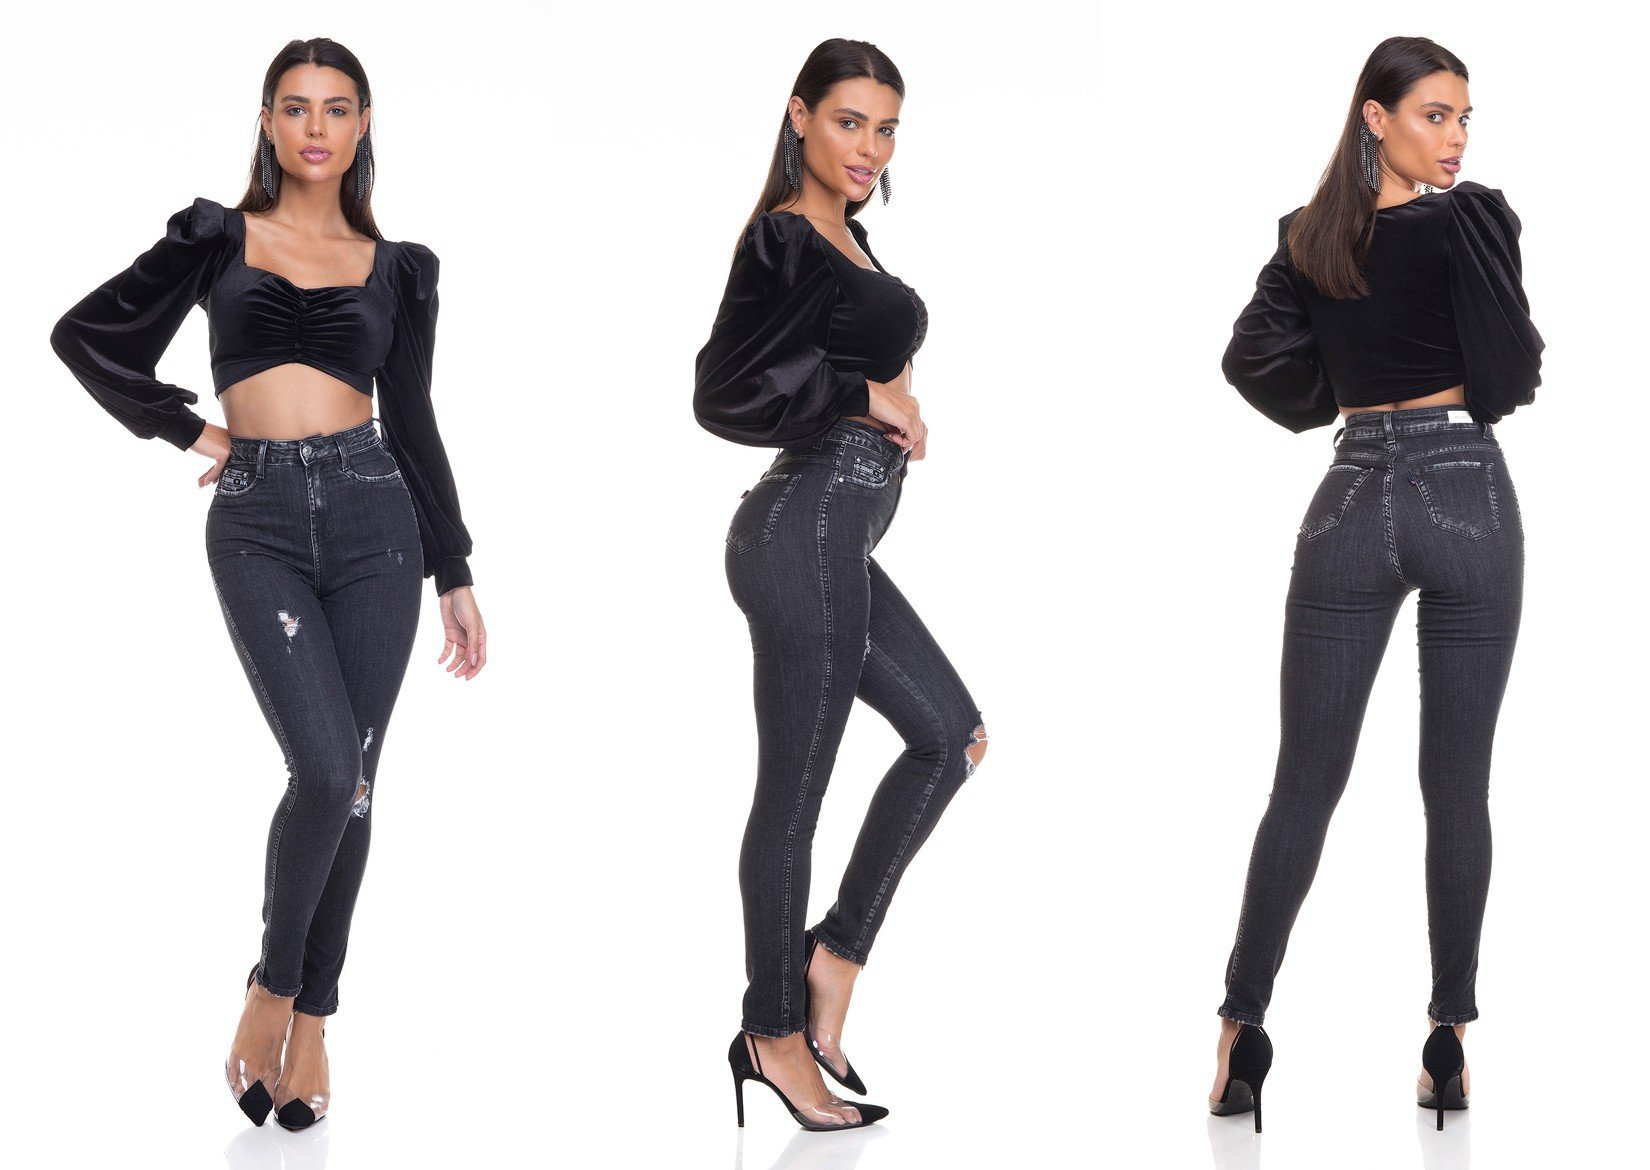 dz3380 calca jeans feminina skinny hot pants cigarrete com puidos denim zero tripla